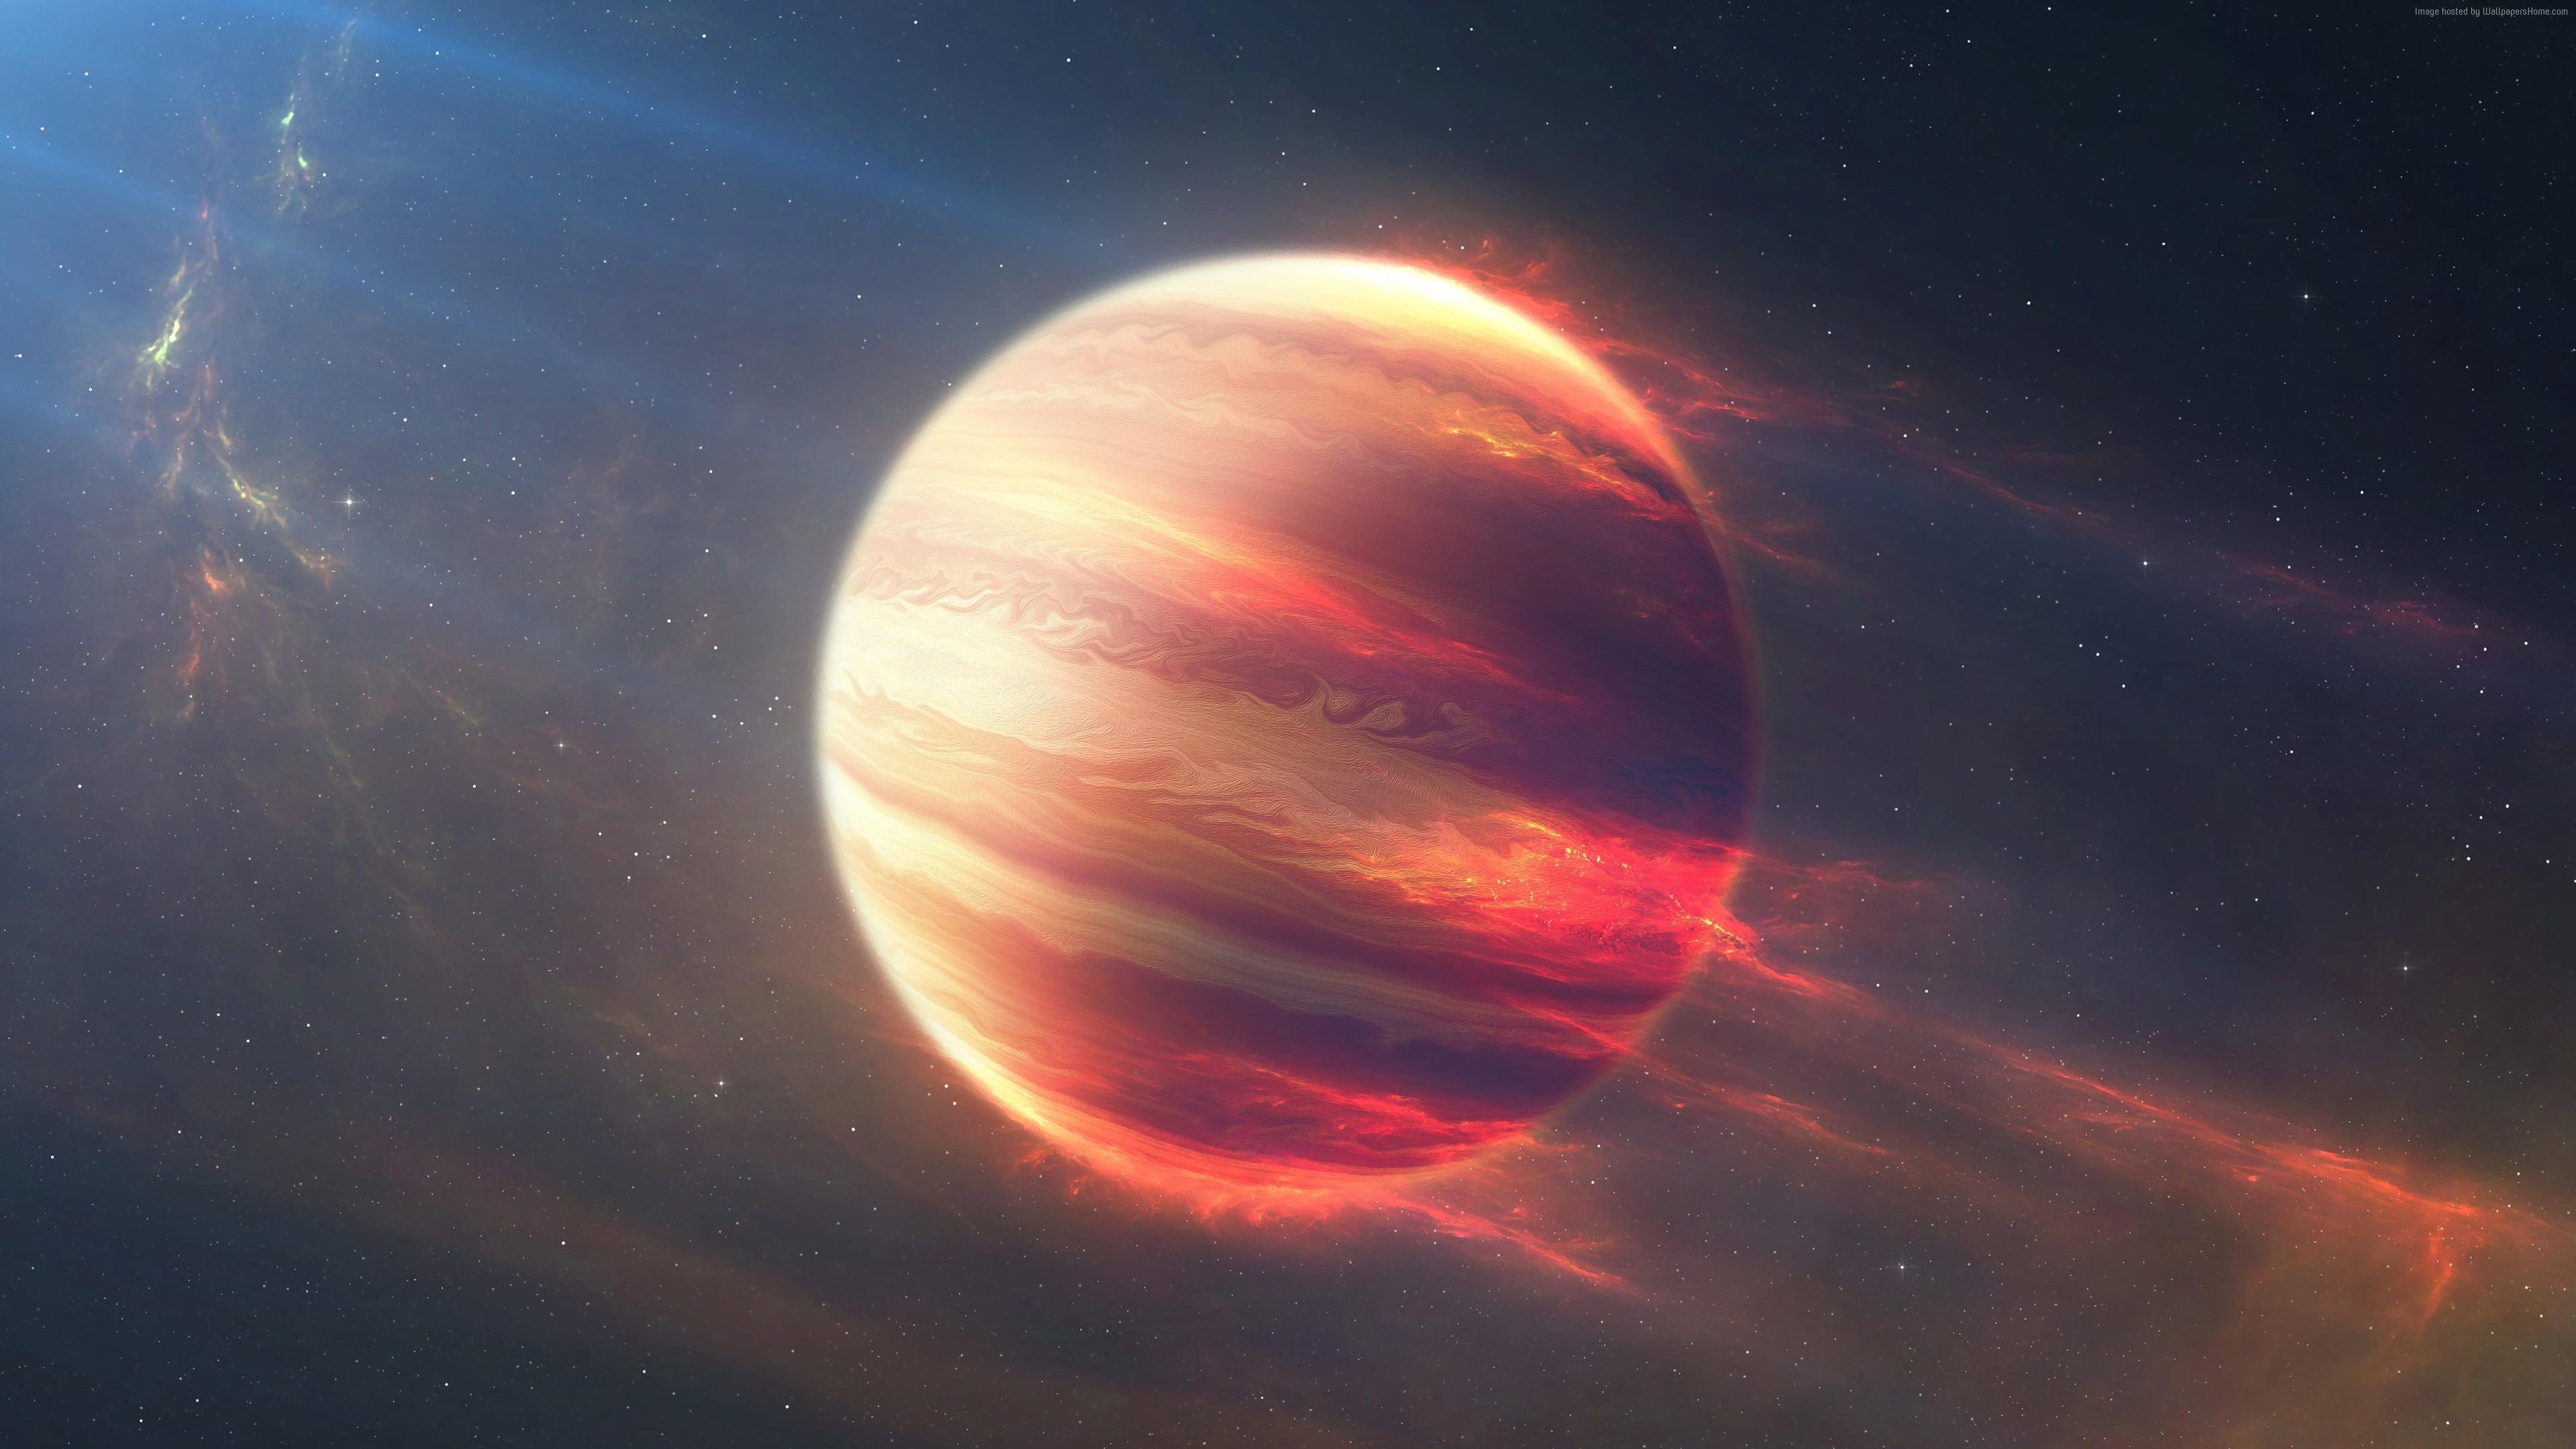 Wallpaper 4k Space Planet 4k 4k Wallpapers Digital Universe